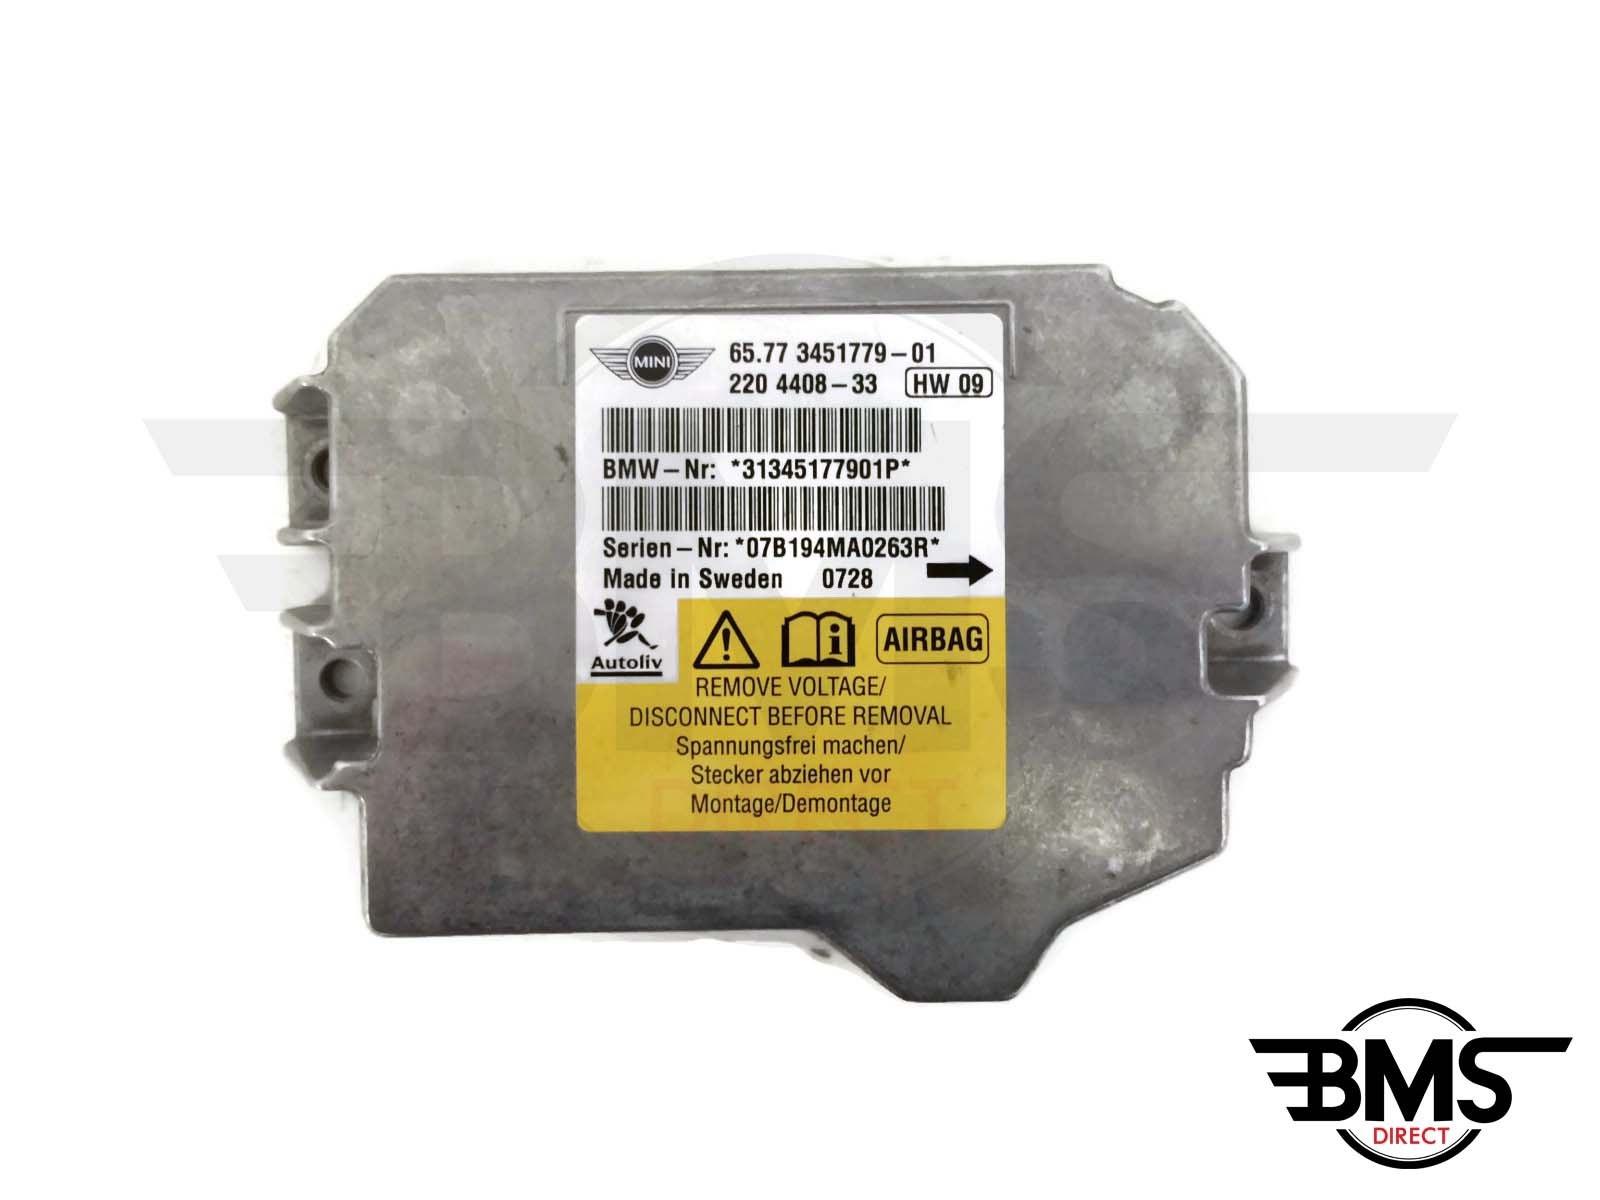 Genuine Used BMW MINI Airbag Control Unit for R56 R55-3451779